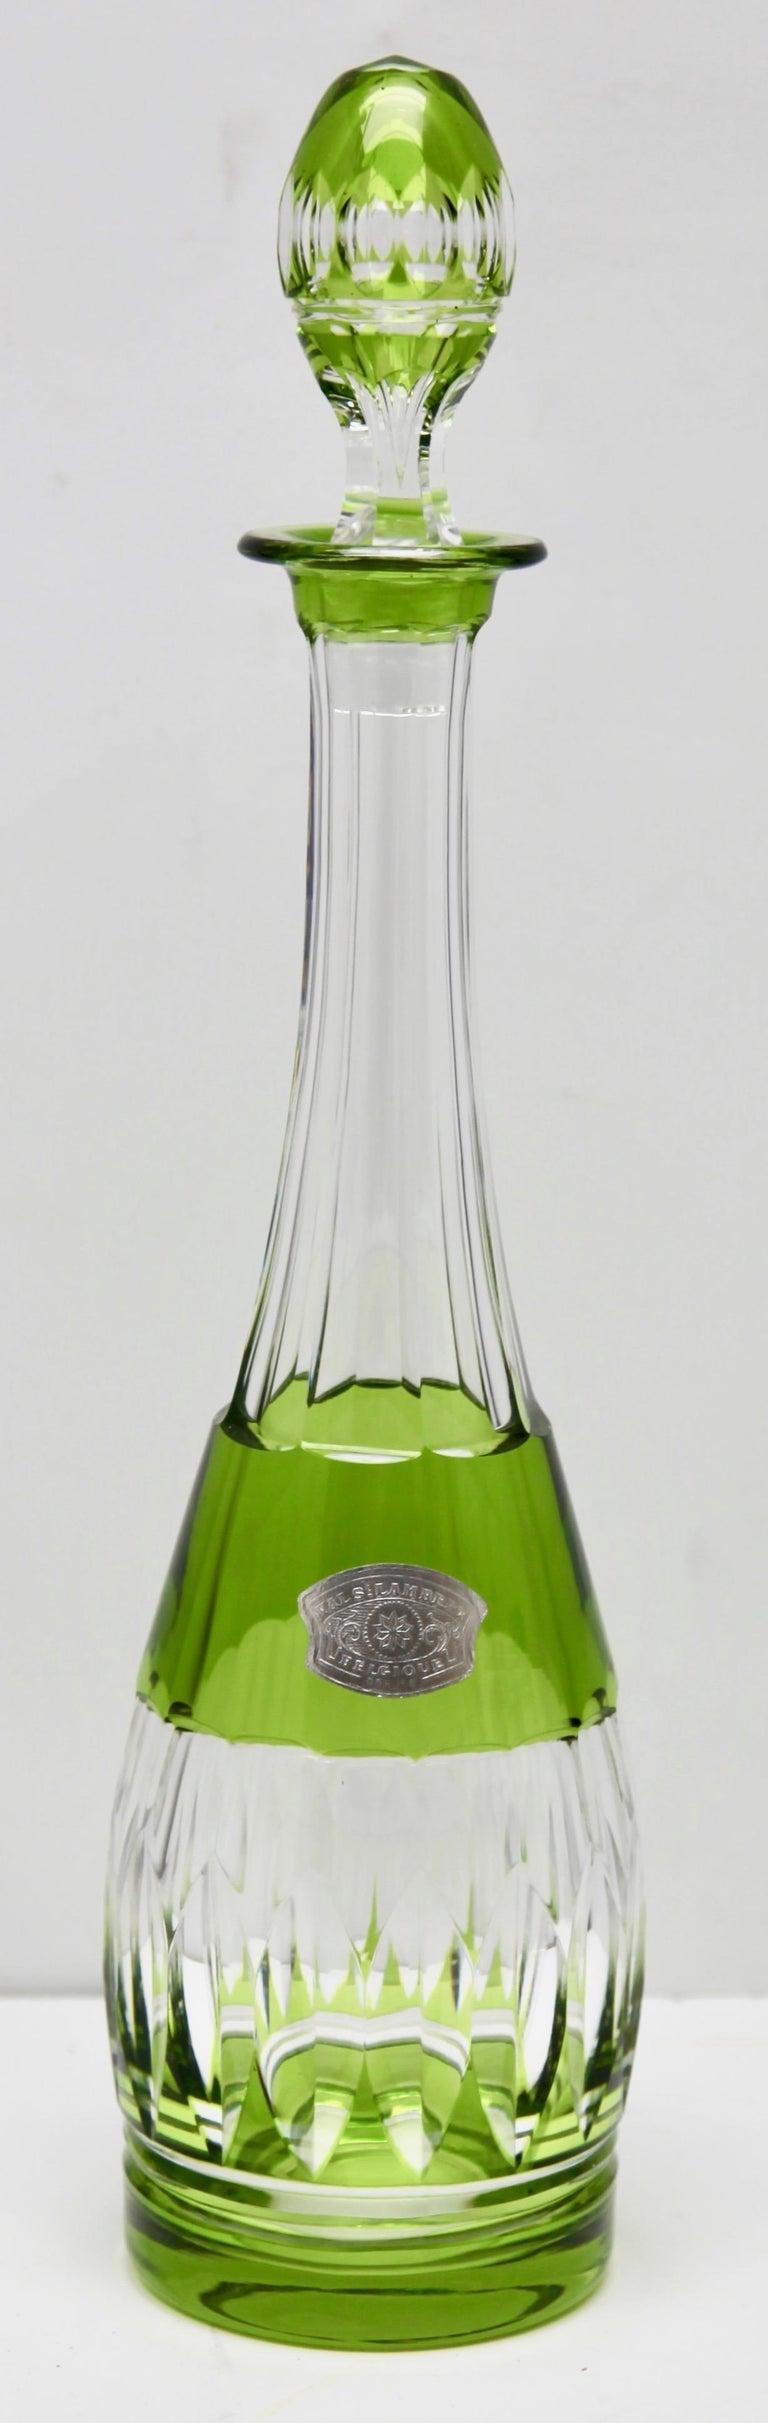 Val Saint Lambert Crystal Decanter, 6 Crystal Wine Goblets Handcut, 1950s For Sale 8